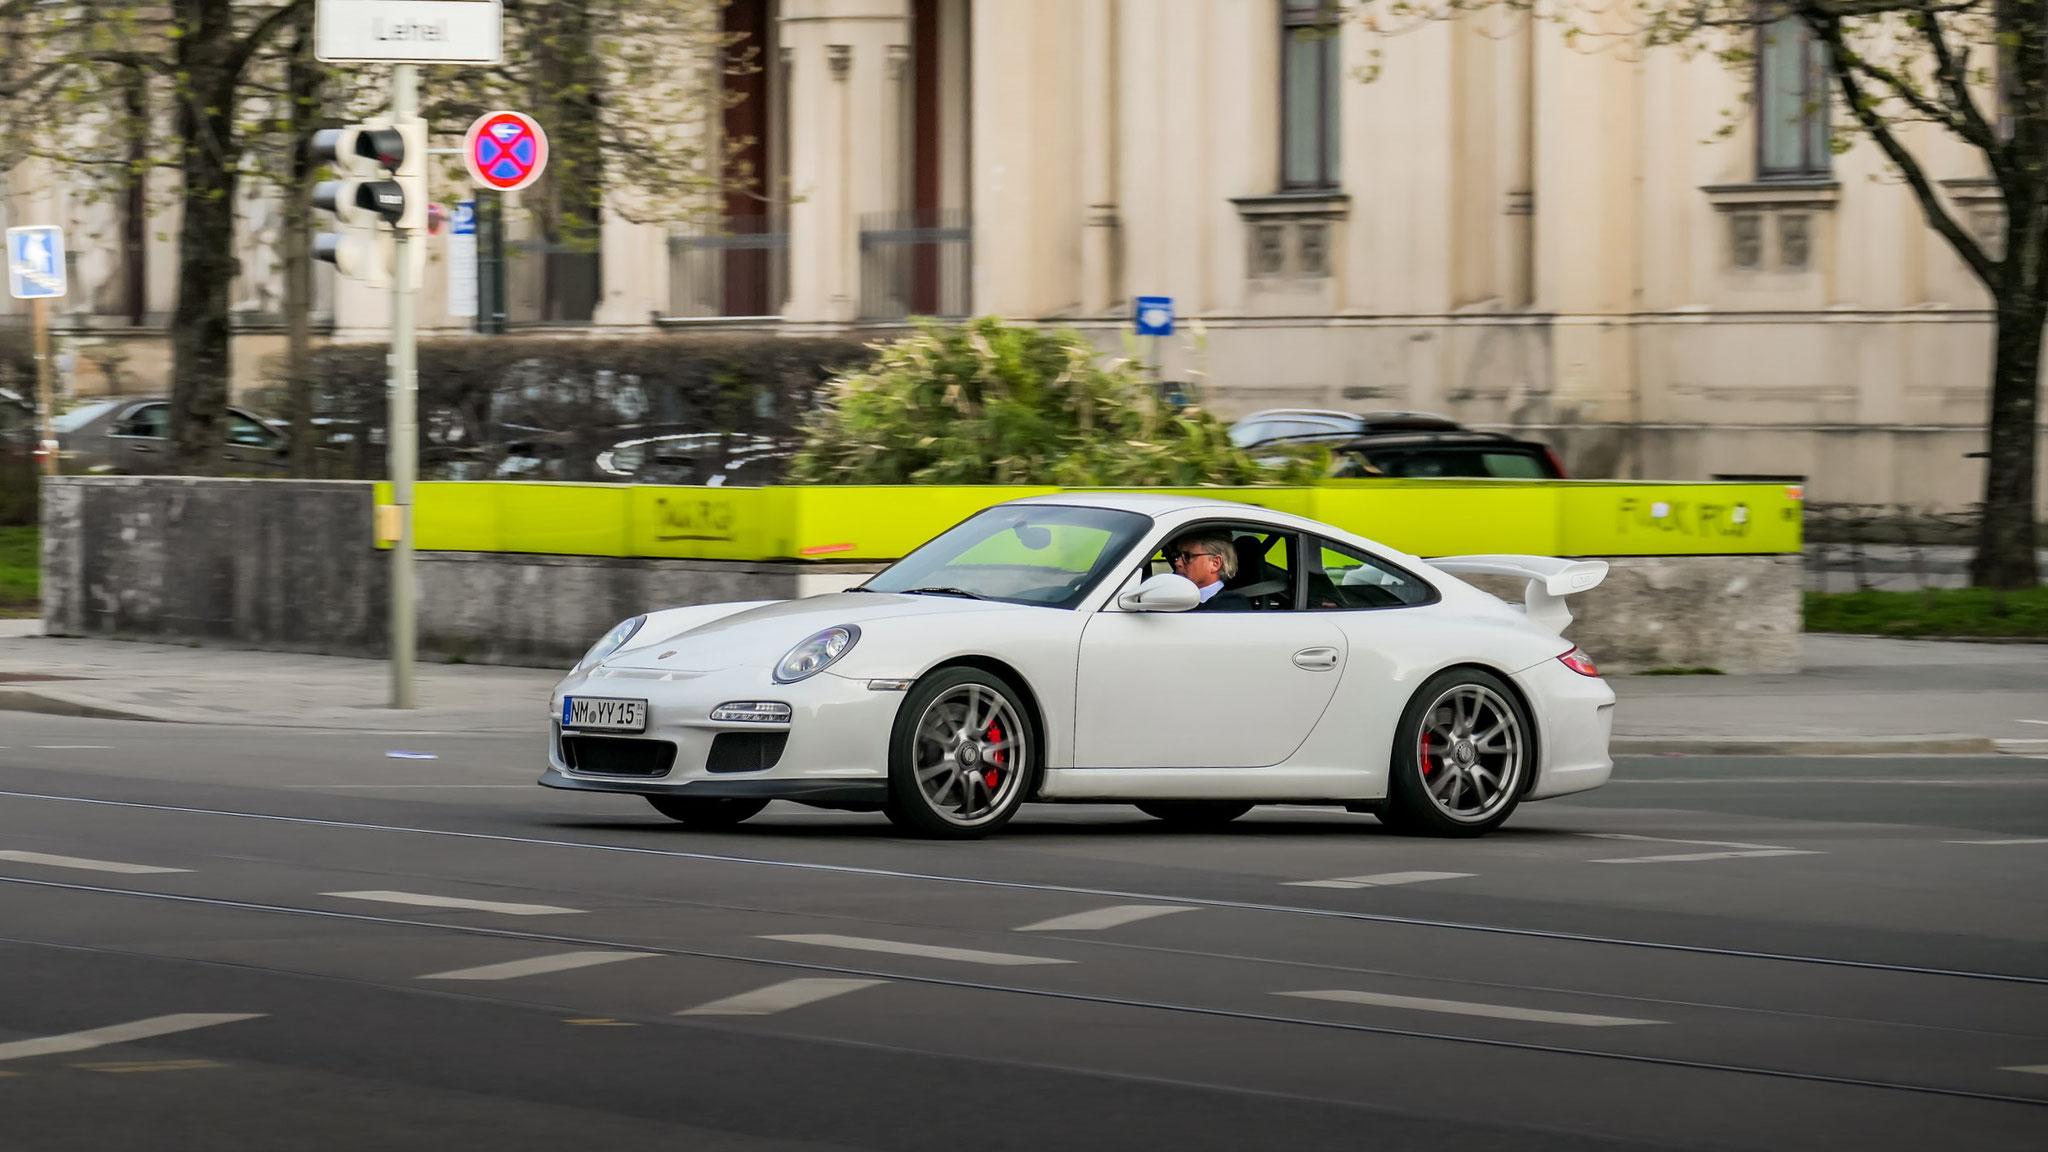 Porsche GT3 997 - NM-YY-15